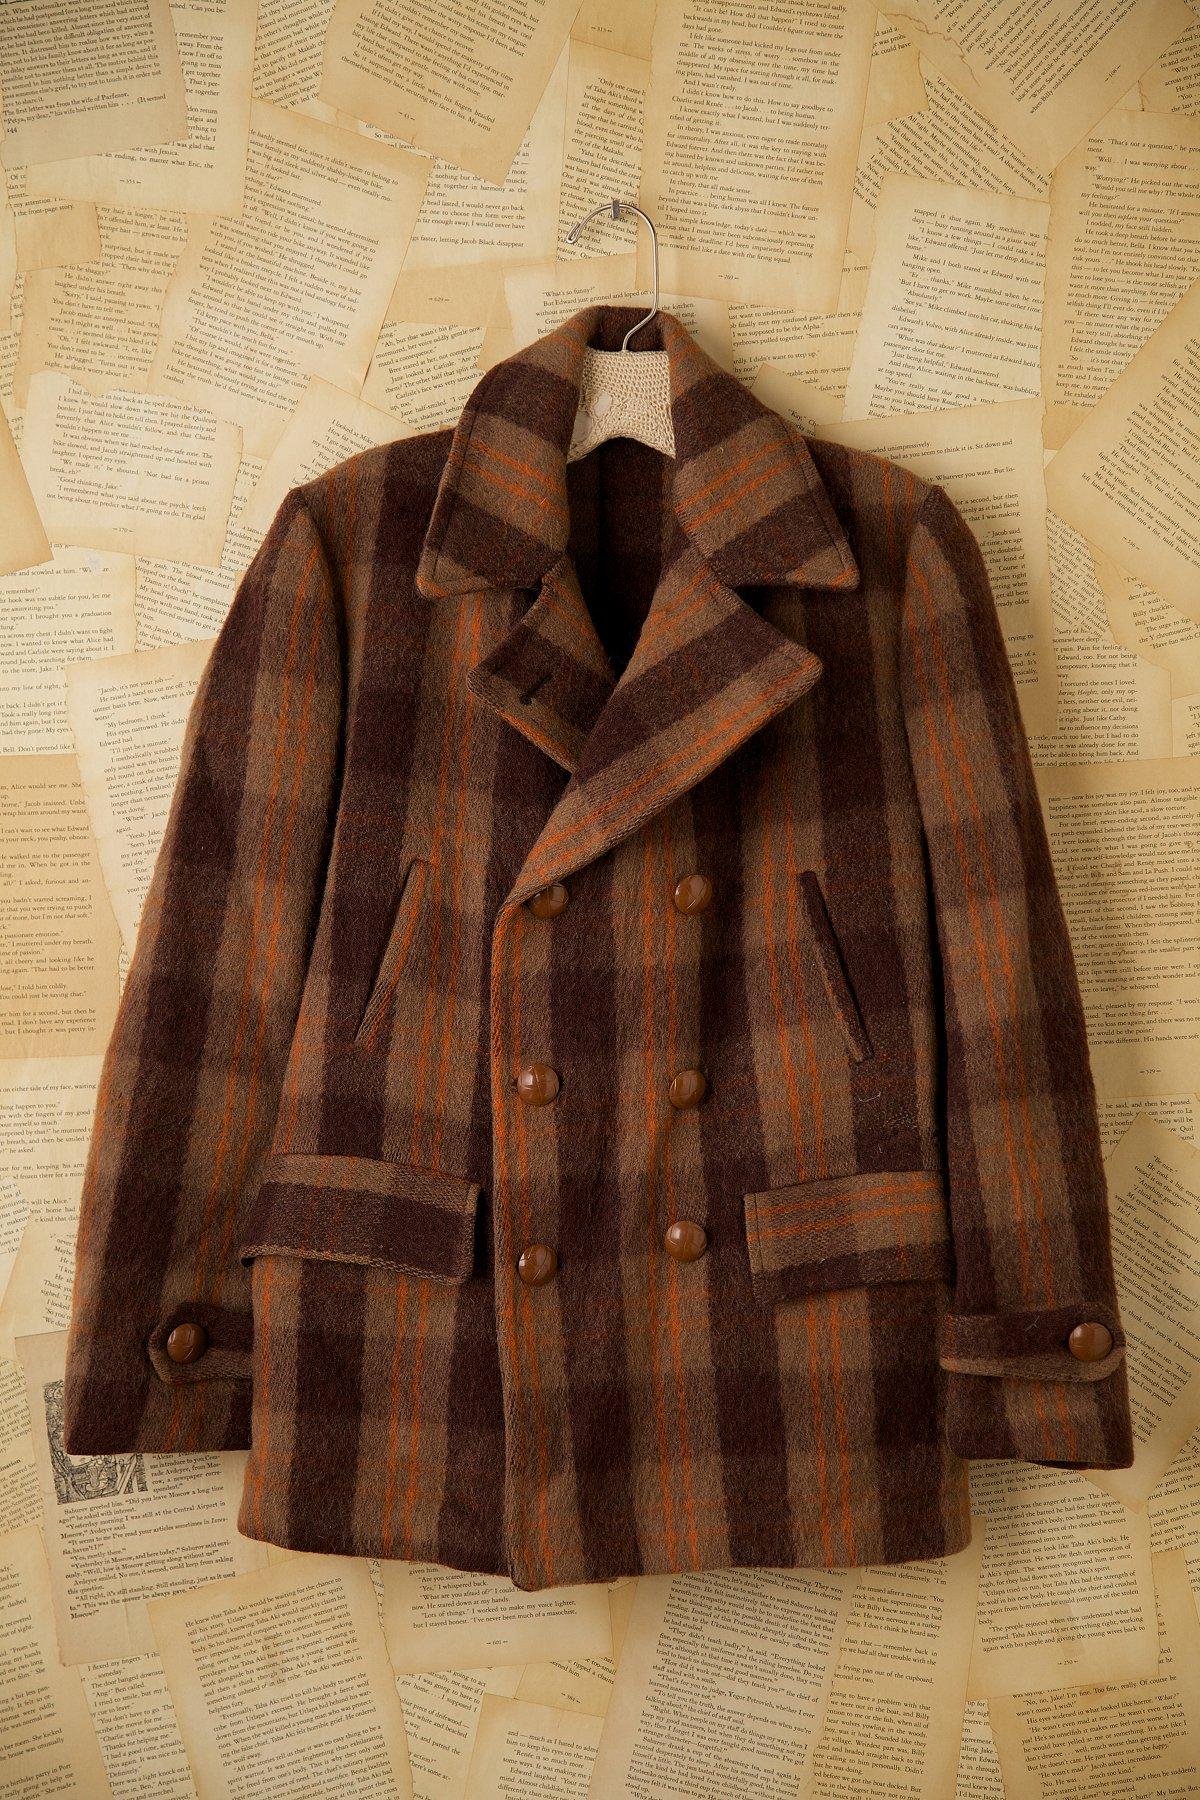 Vintage Three-Quarter Length Wool Plaid Jacket